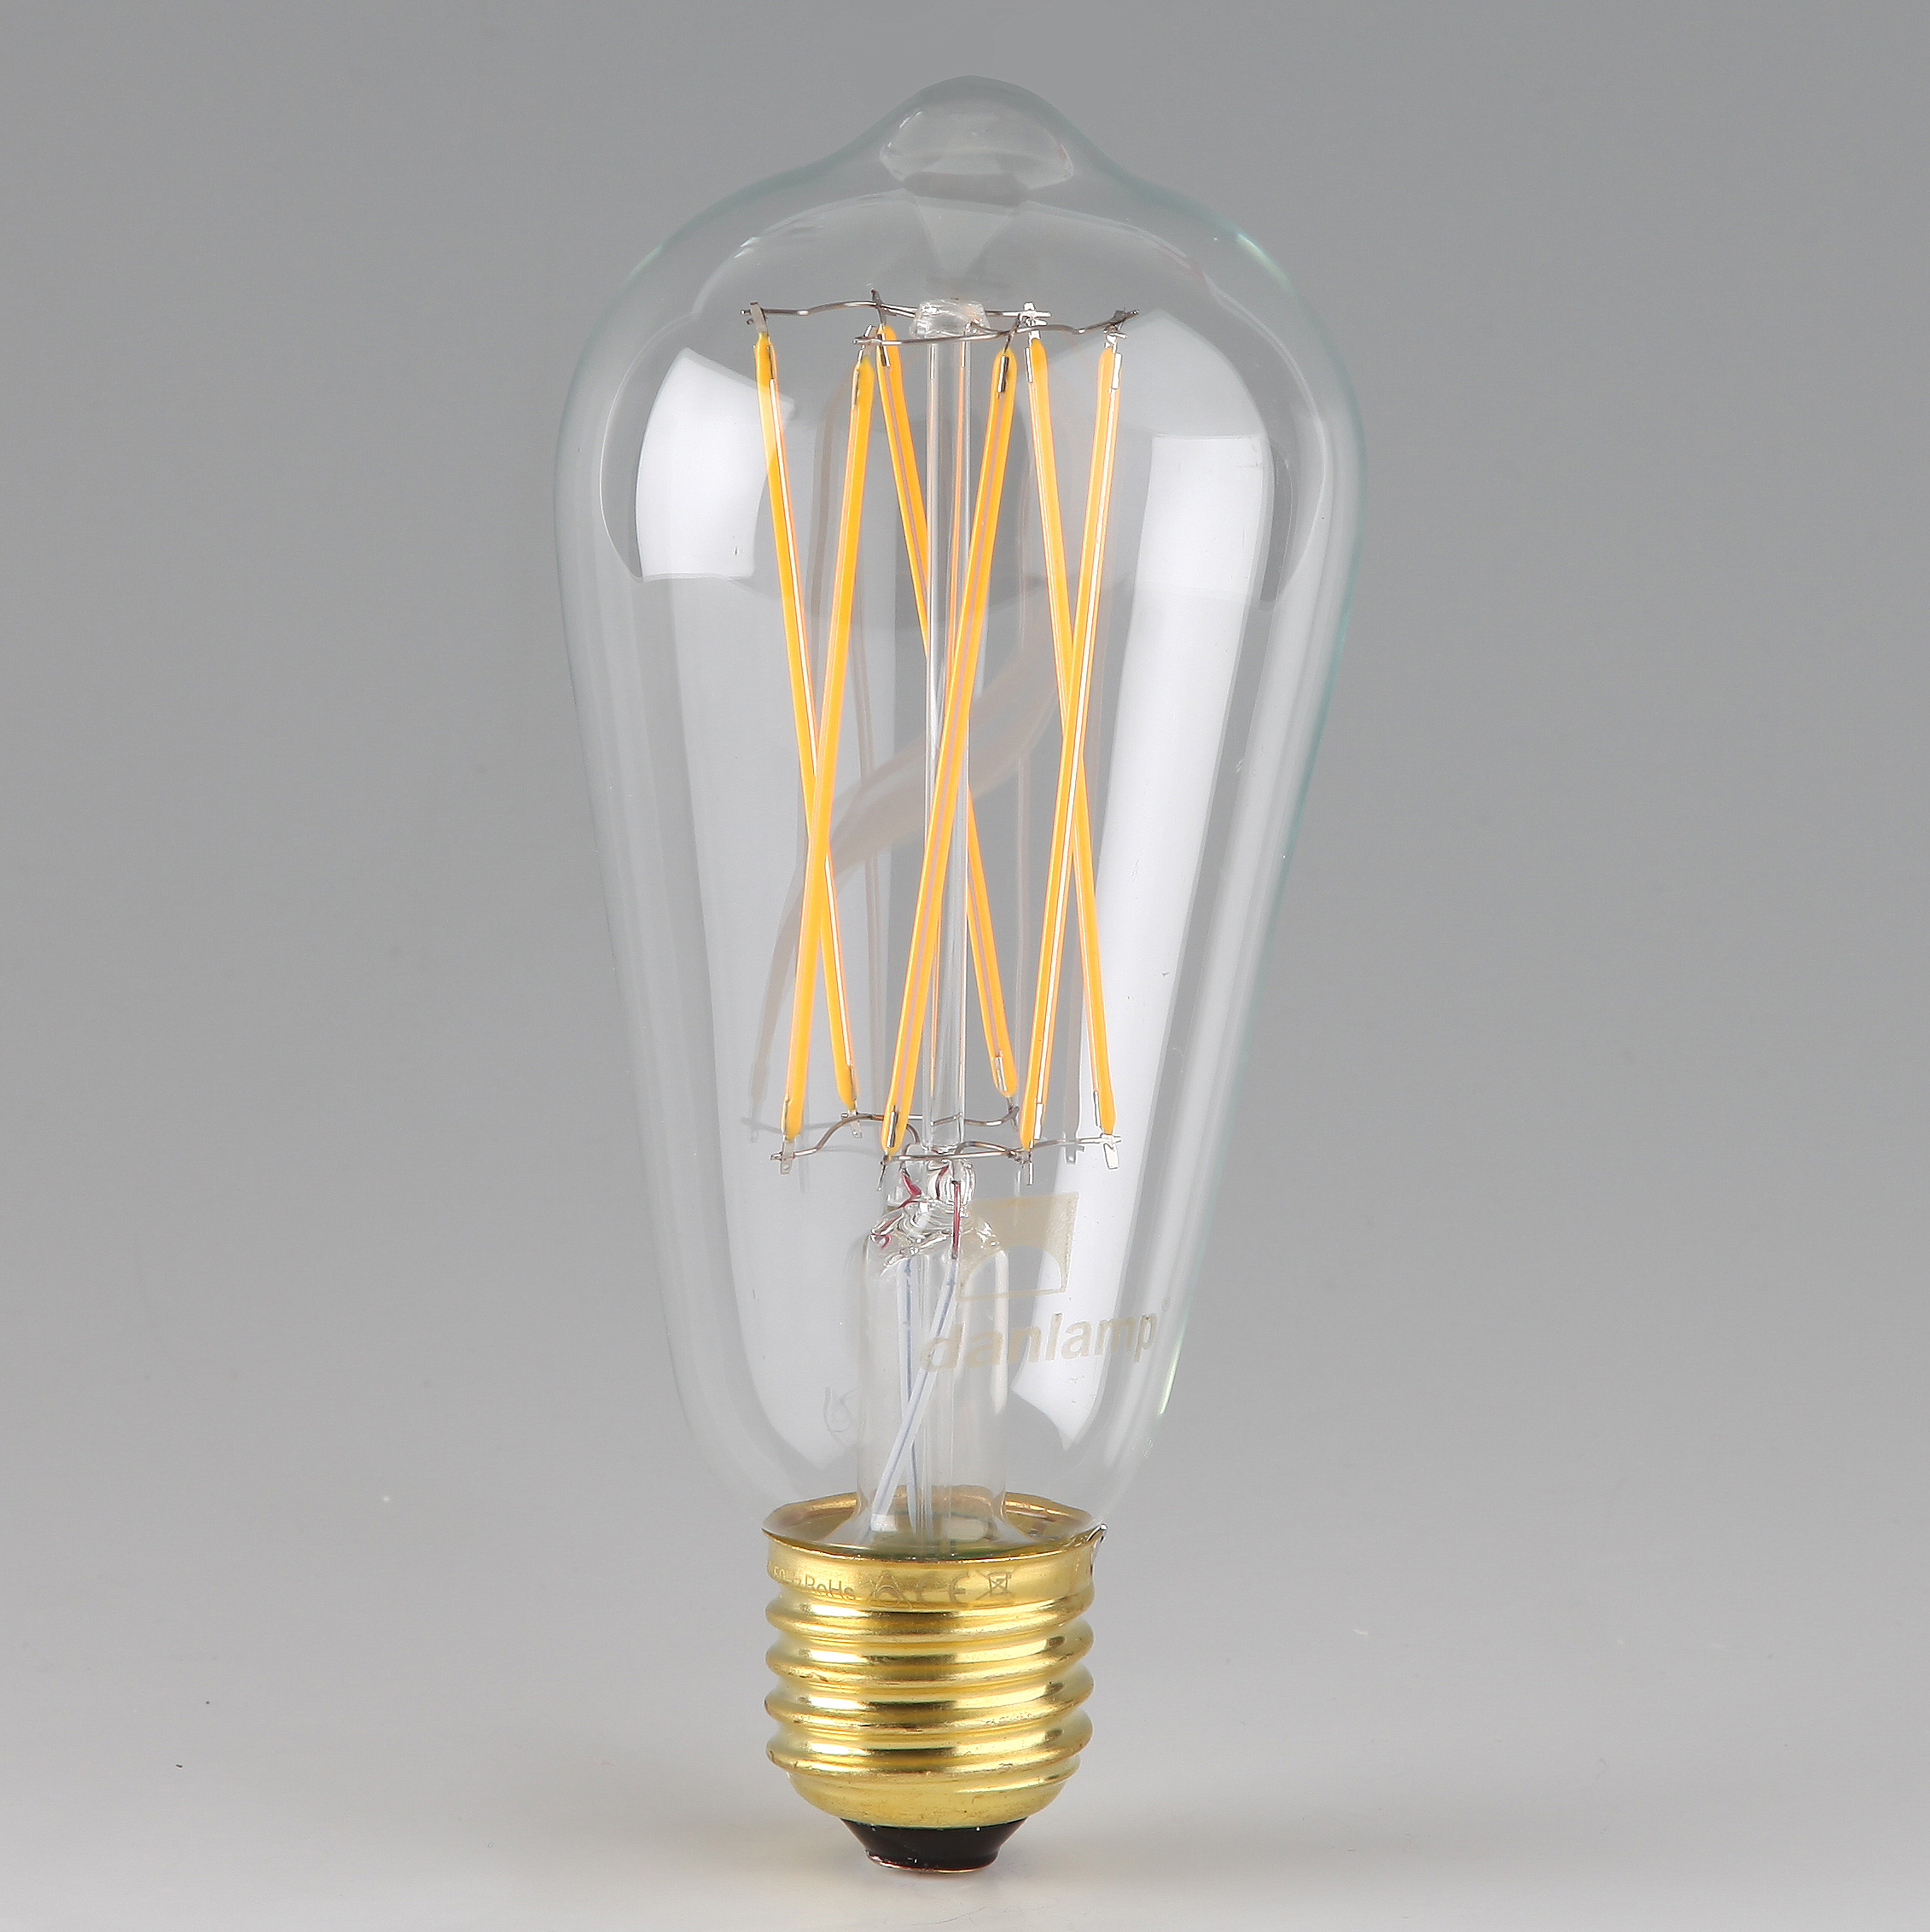 e27 led edison lamp 1 diy lampenbau sterreich. Black Bedroom Furniture Sets. Home Design Ideas